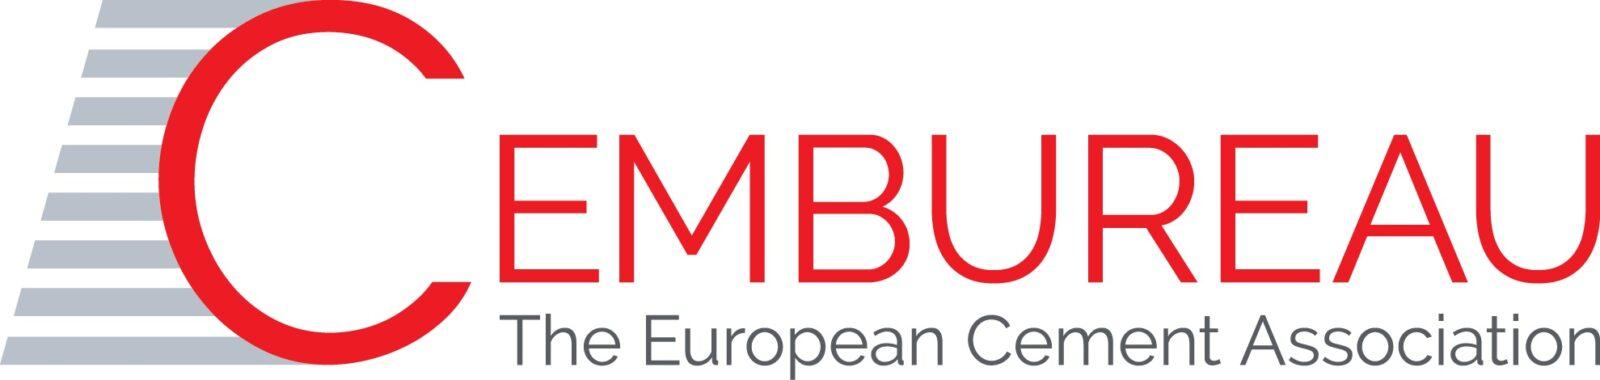 CEMBUREAU - Europäischer Verband